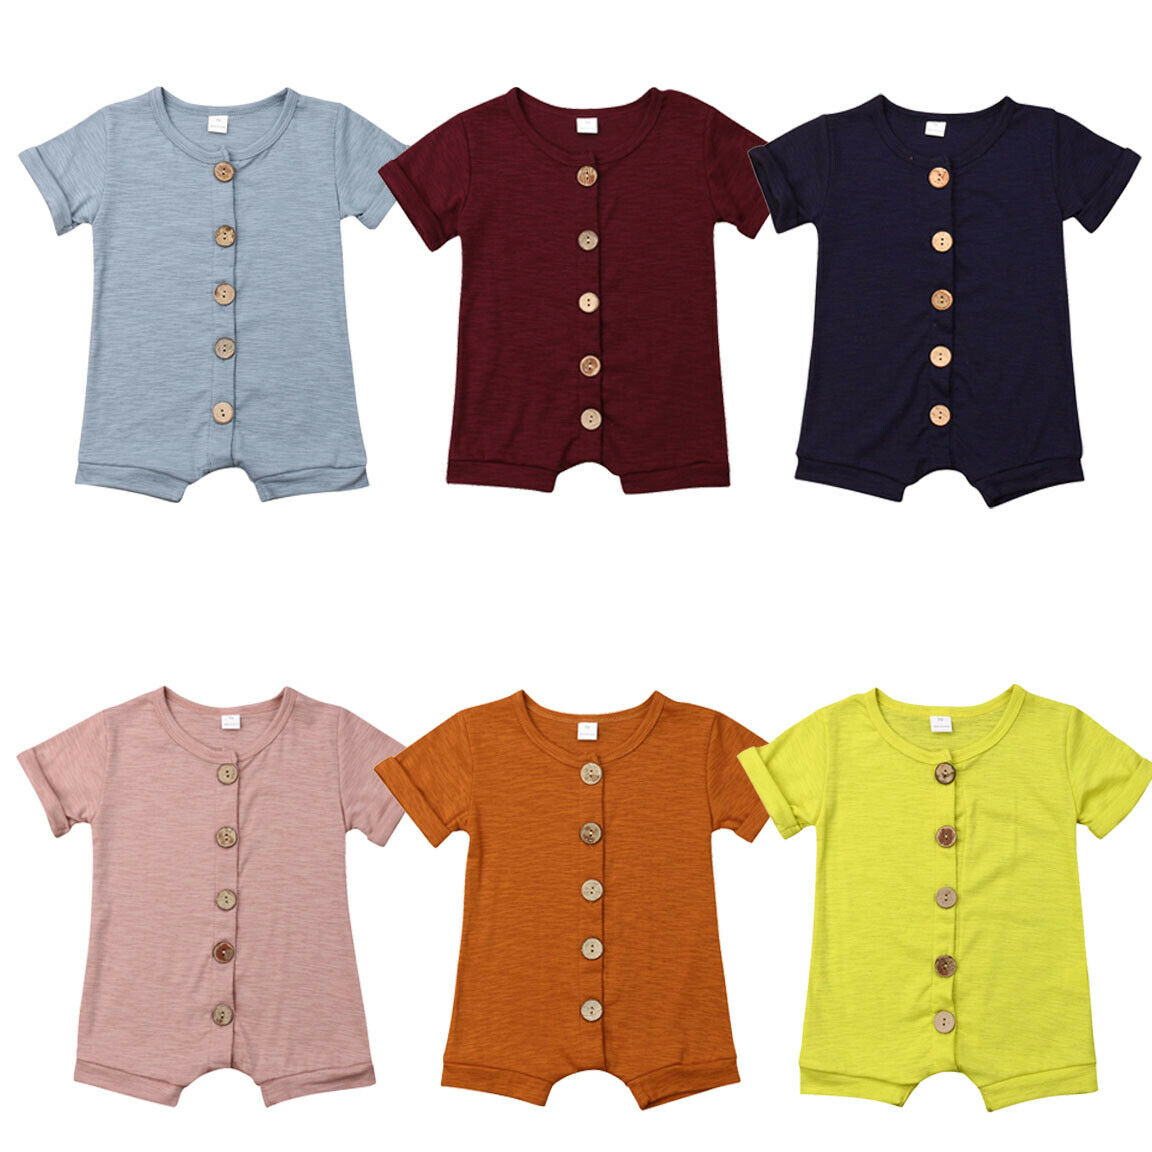 Infant Neugeborenen Baby Baumwolle Tasten Strampler Kurzarm Snaps One-stück Overall Overall Sommer Sunsuit Outfit Klassische Kleidung